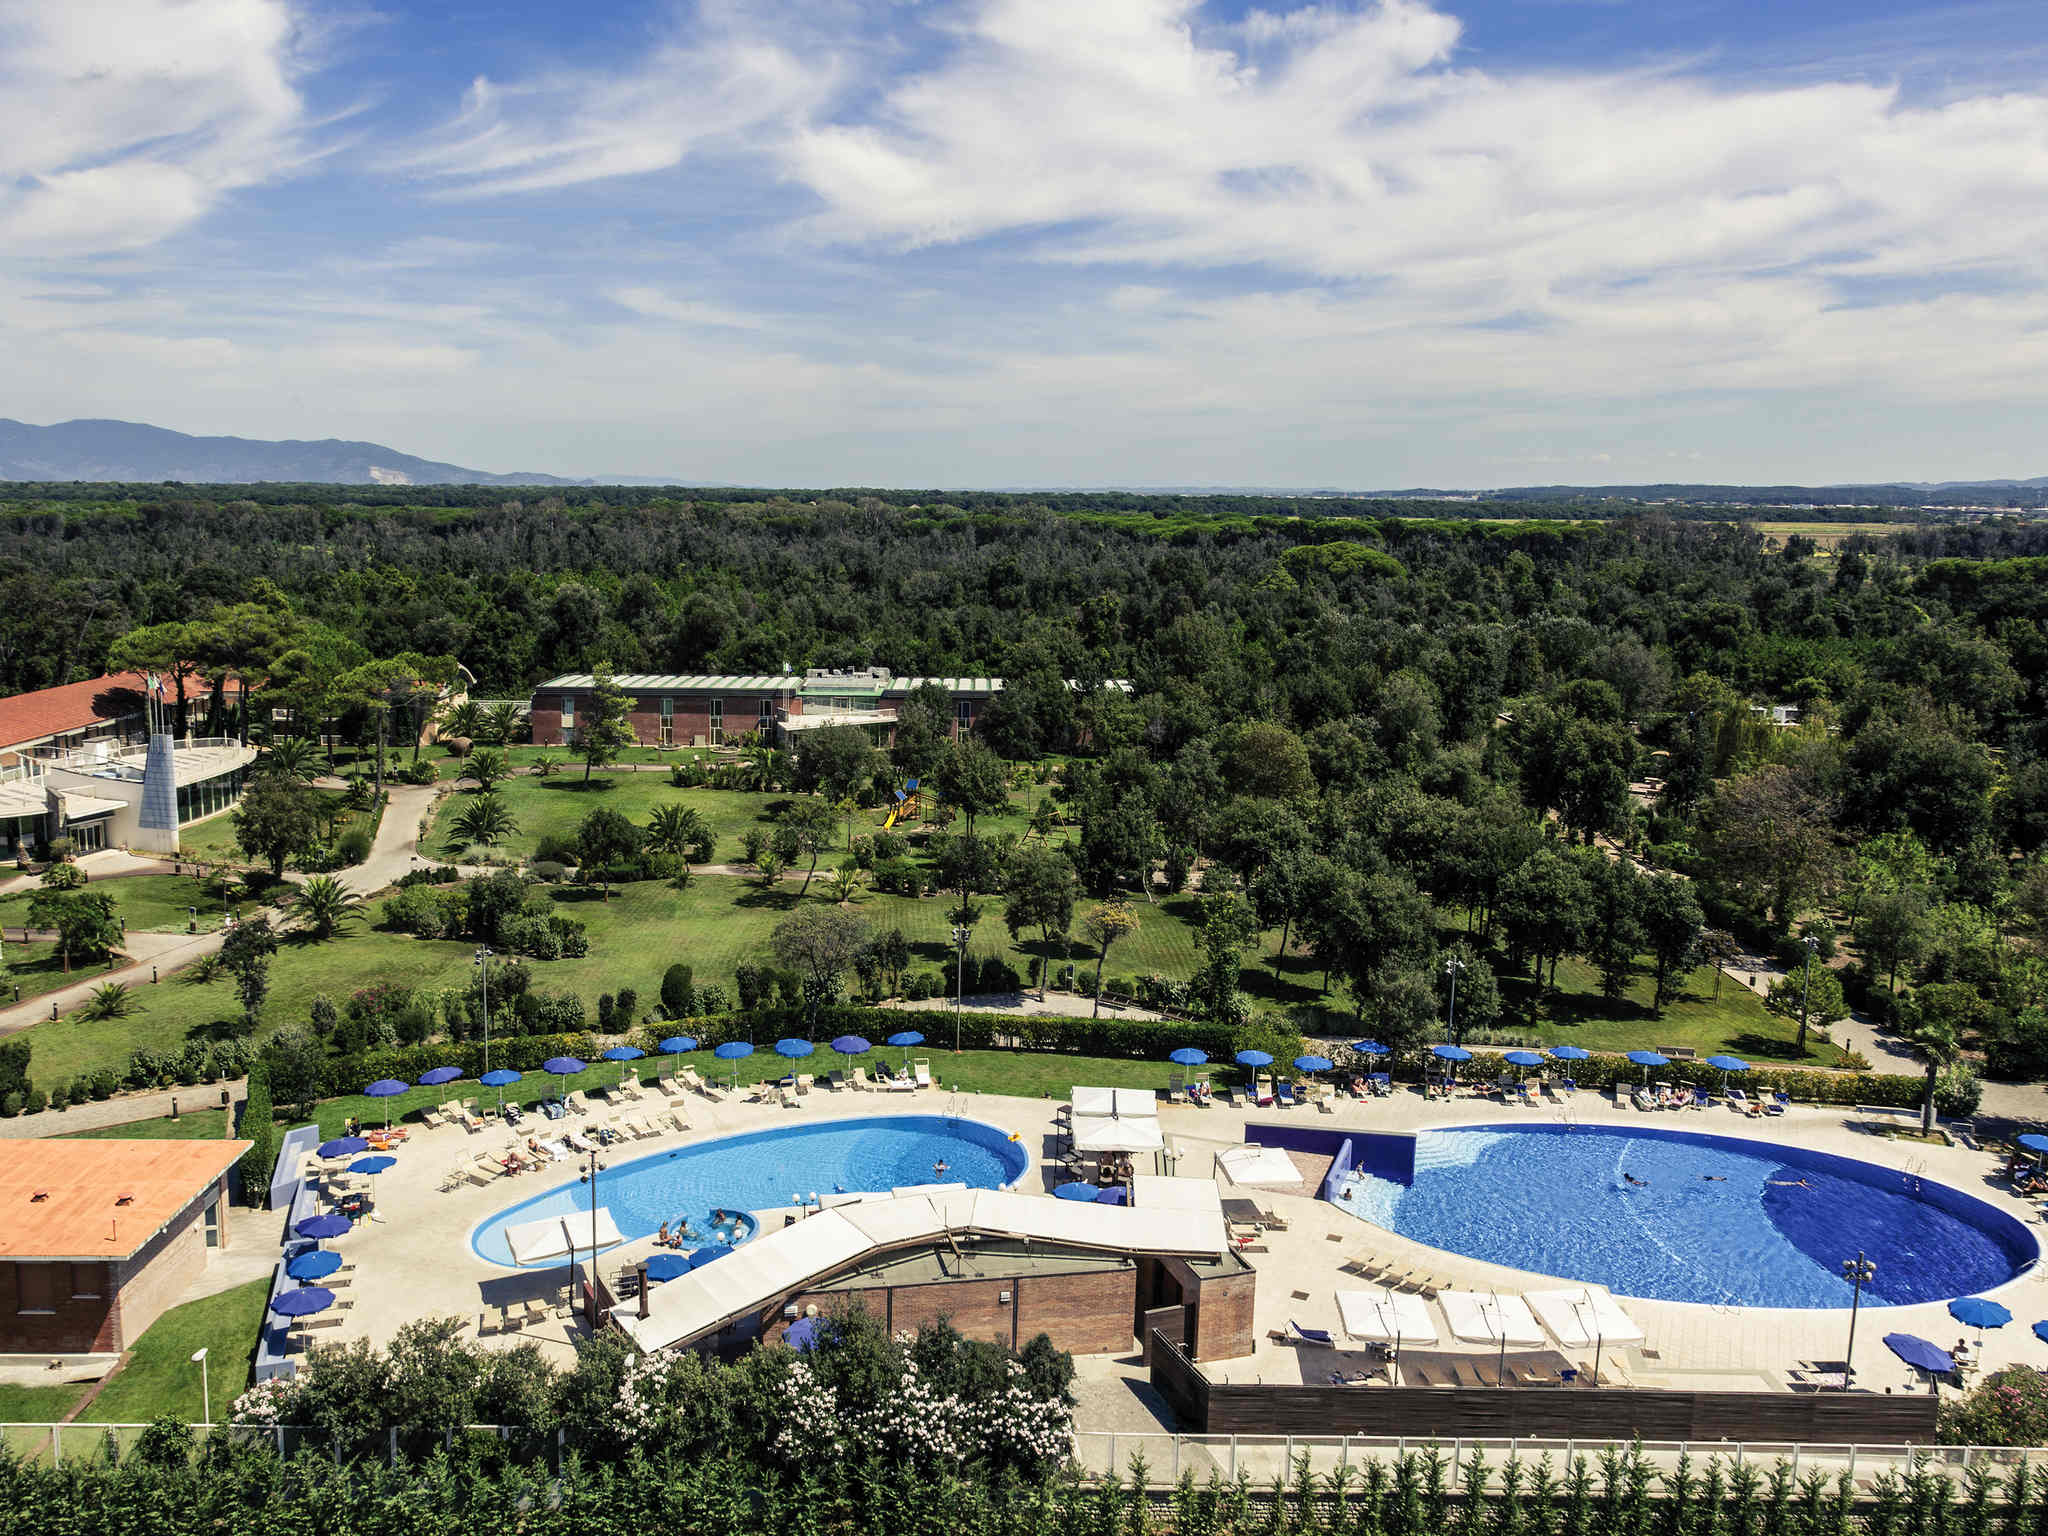 Hotell – Hotel Mercure Tirrenia Green Park